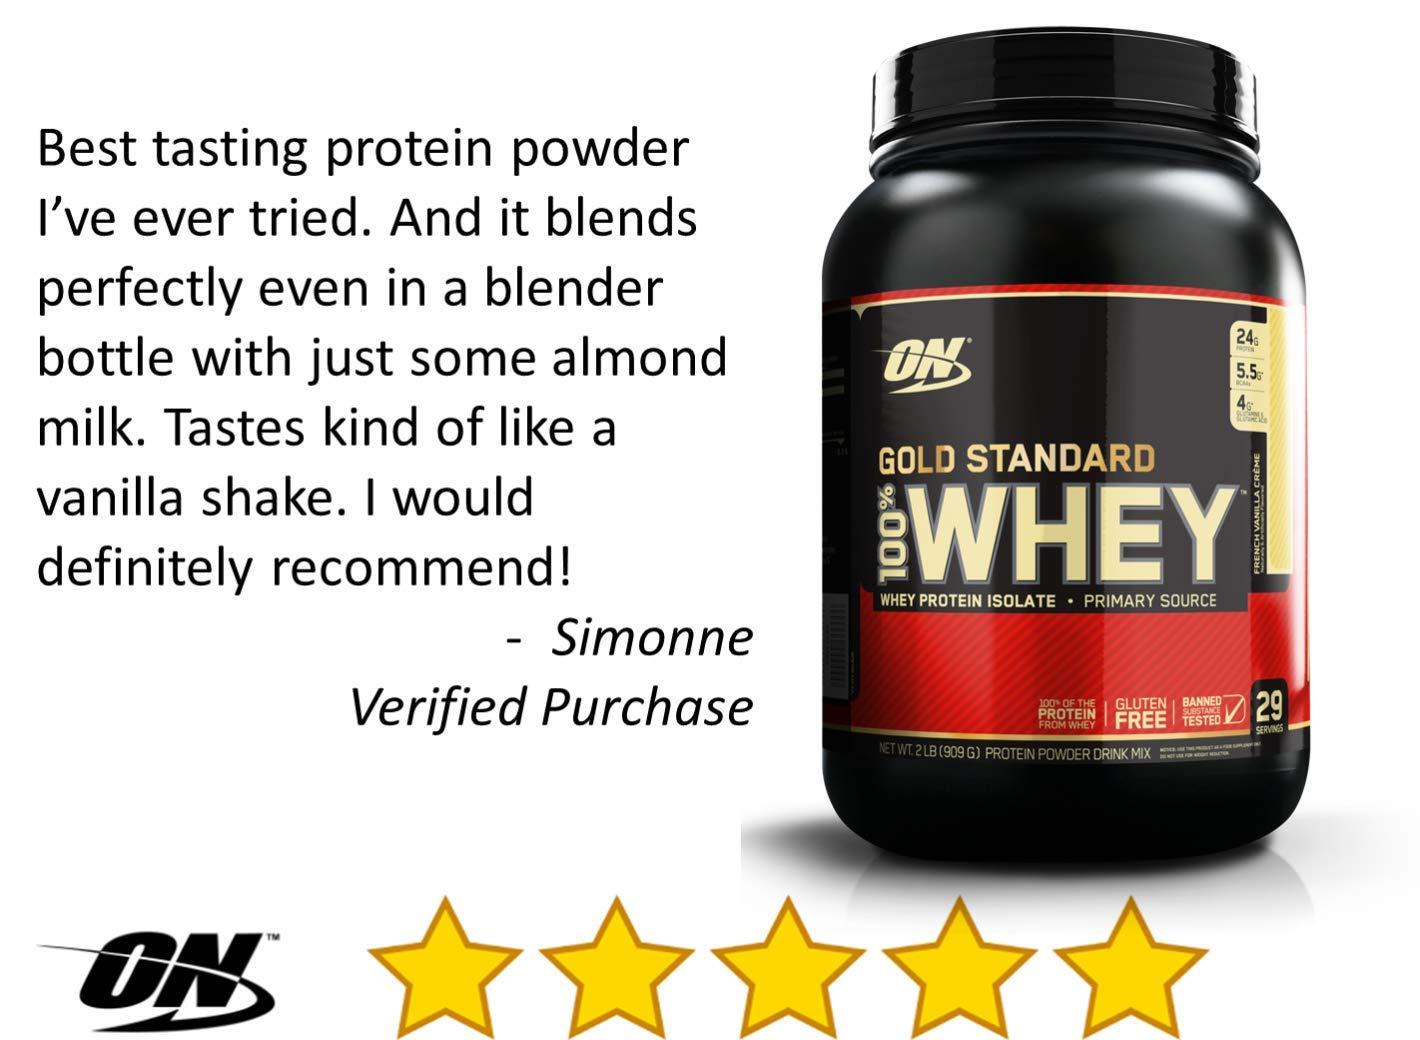 dcf43eed4 OPTIMUM NUTRITION GOLD STANDARD 100% Whey Protein Powder